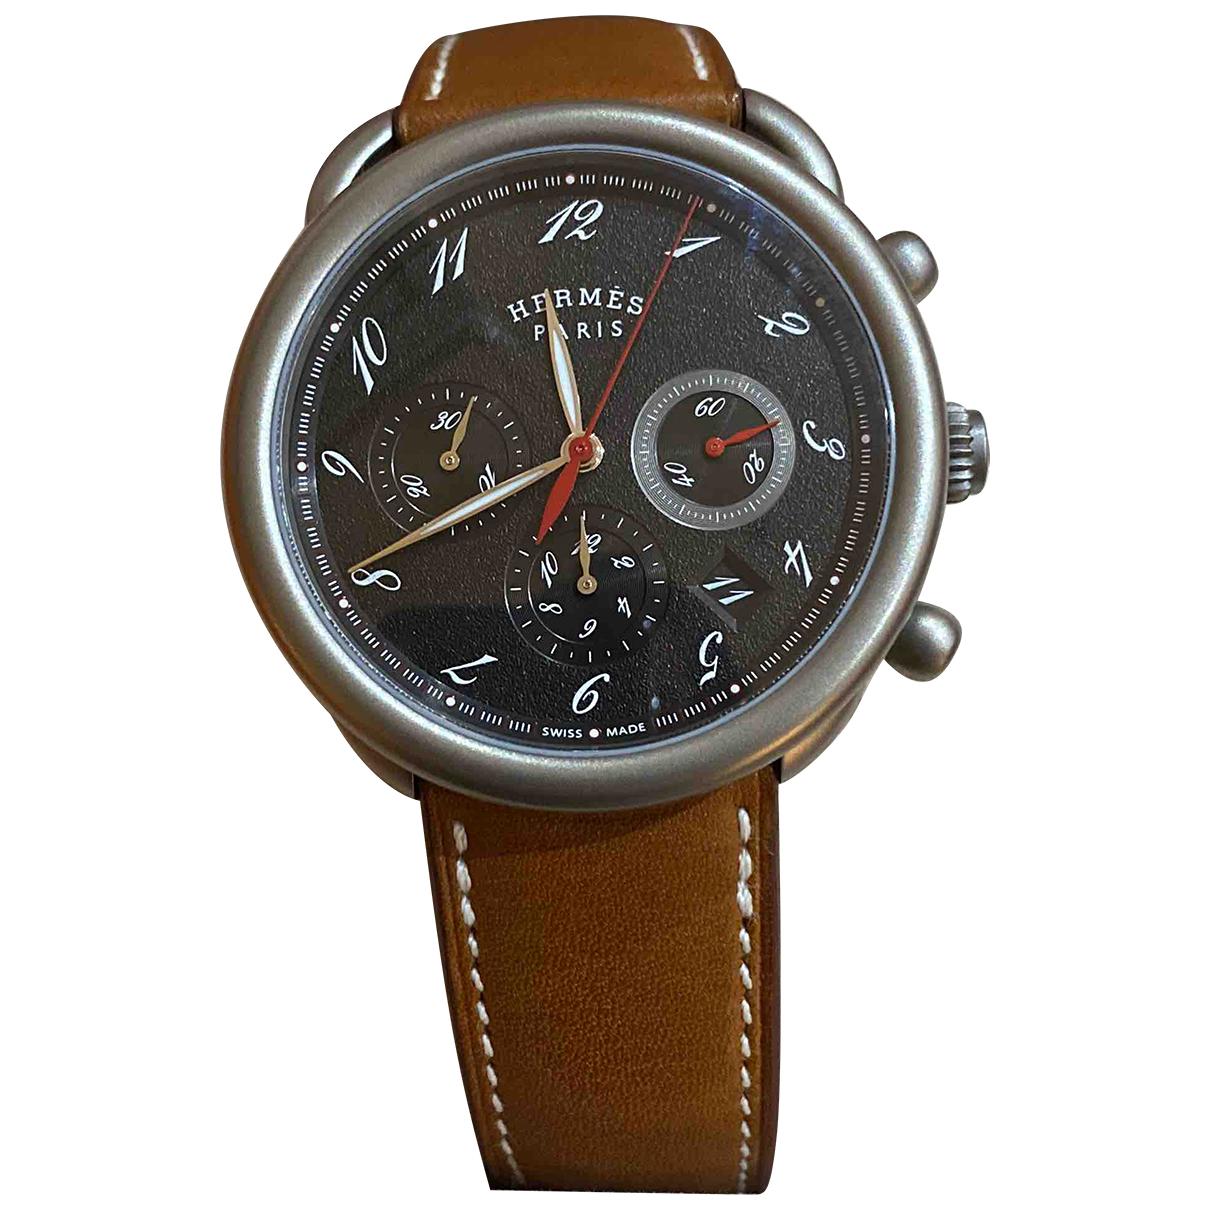 Relojes Arceau Chronographe Hermes